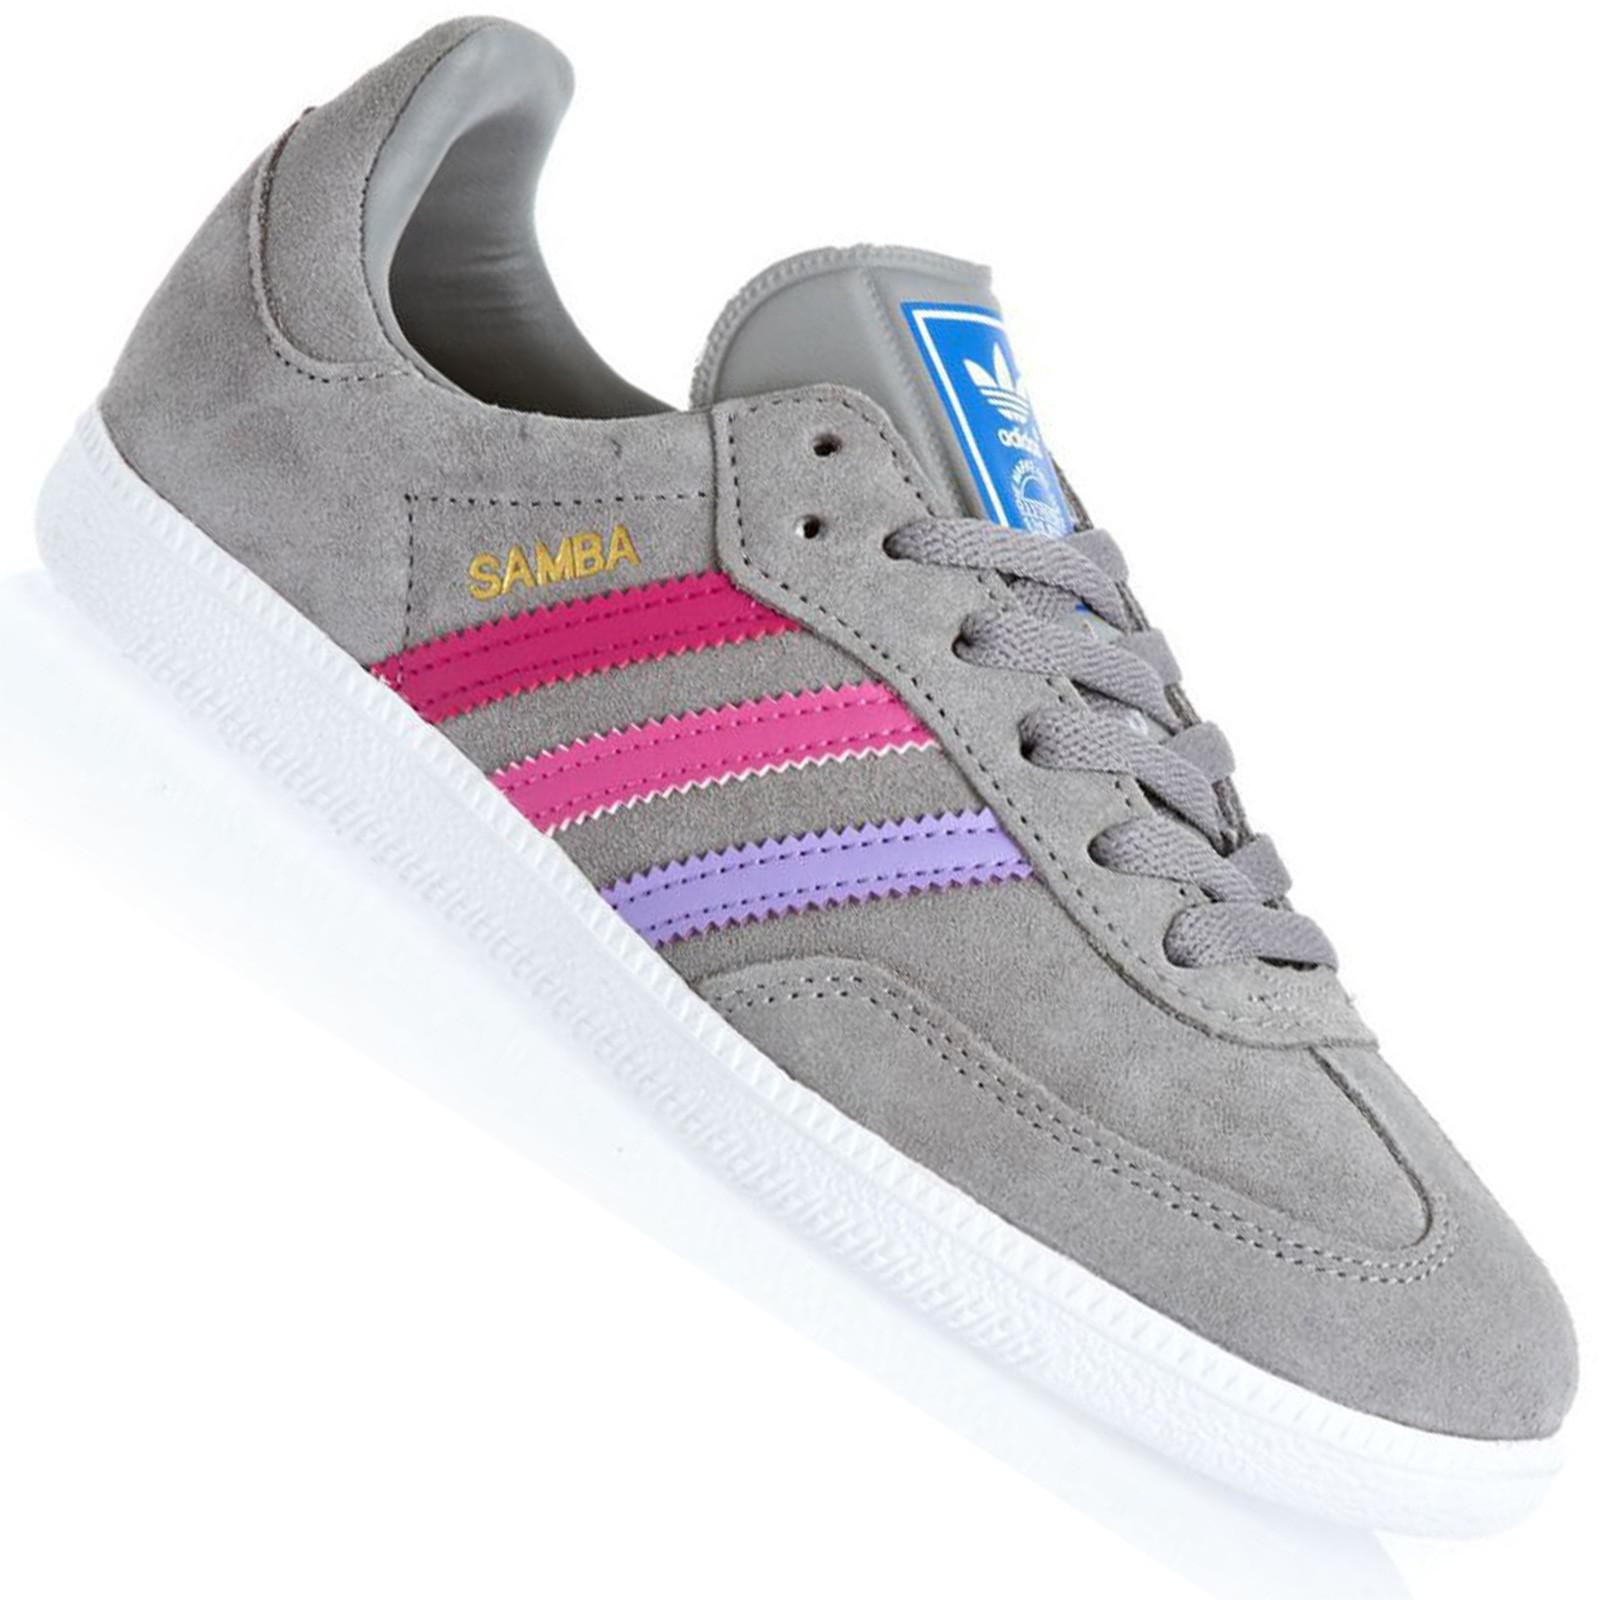 reputable site f5bdf 6f556 Kinder Sneaker Samba Schuhe Originals Grau Adidas Leder Pink Vintage  tqpaEwA5x